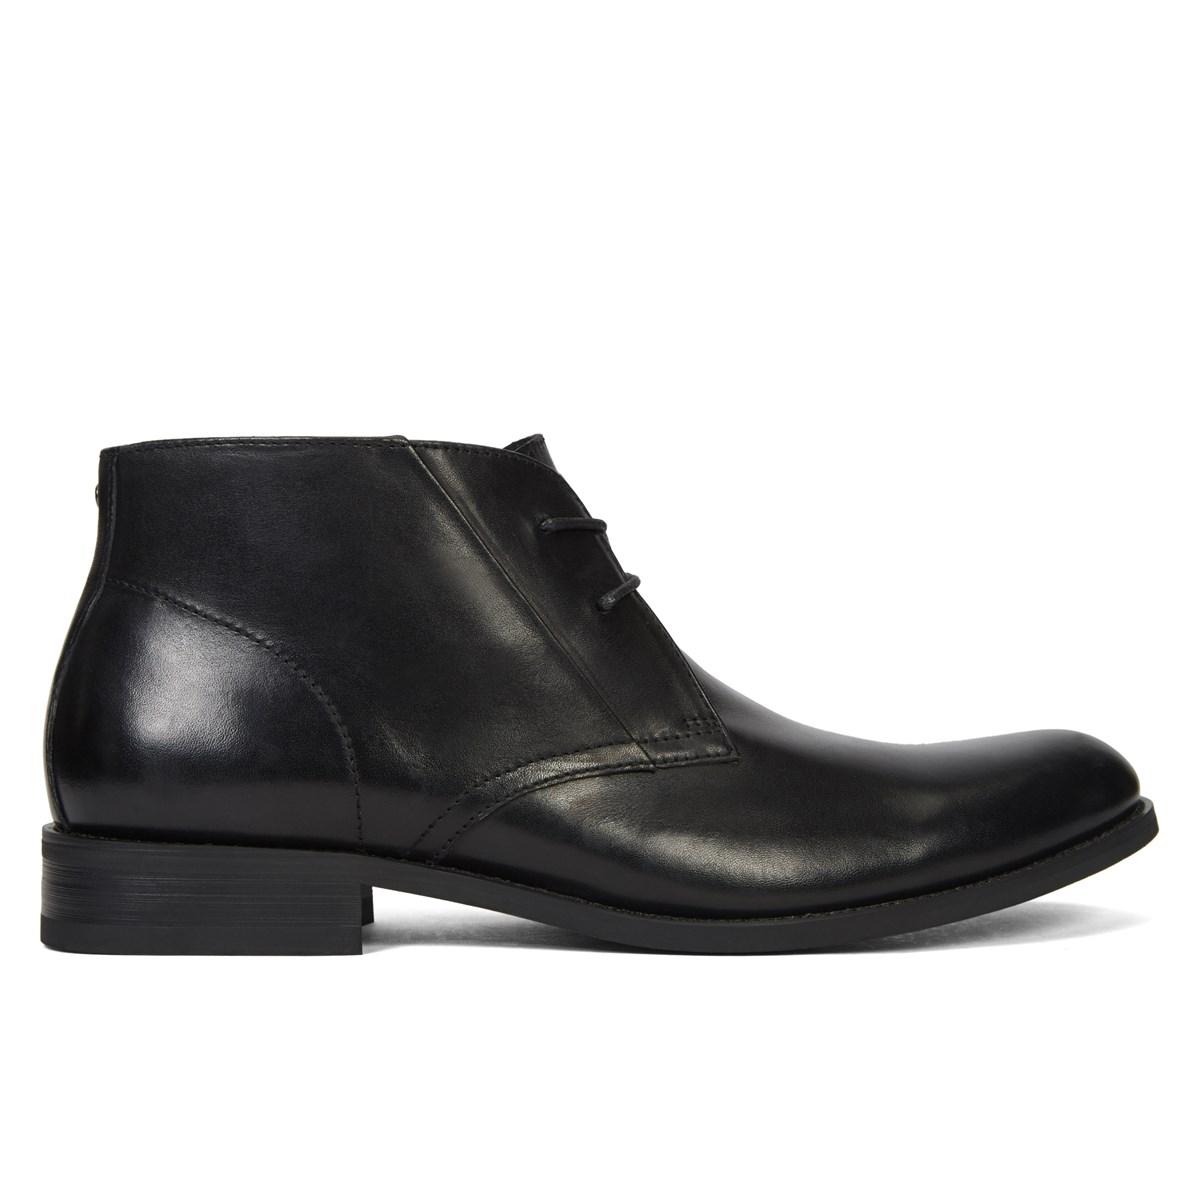 s adelmo leather black lace up shoe burgundy